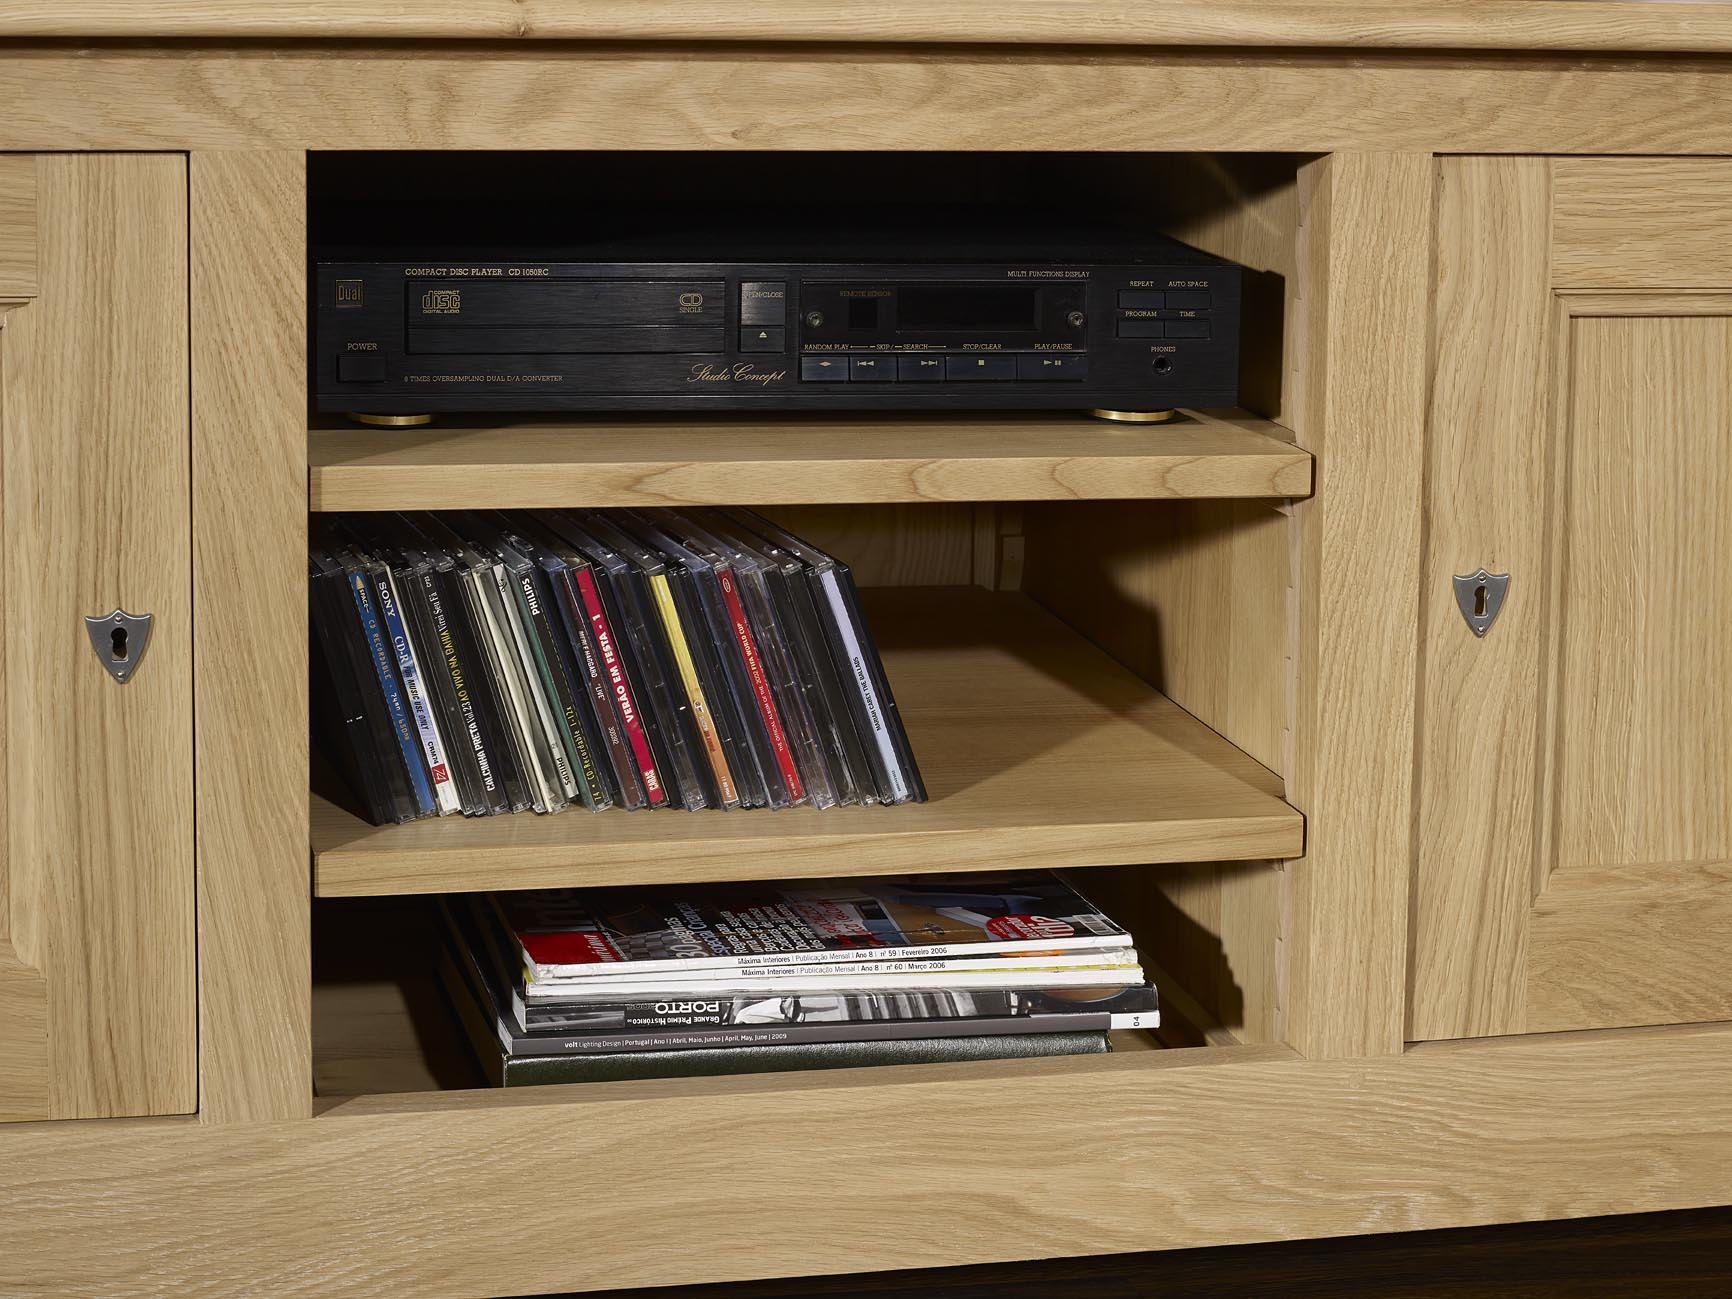 meuble en ch ne meuble tv 16 9eme amaury r alis en ch ne massif de style campagnard finition. Black Bedroom Furniture Sets. Home Design Ideas